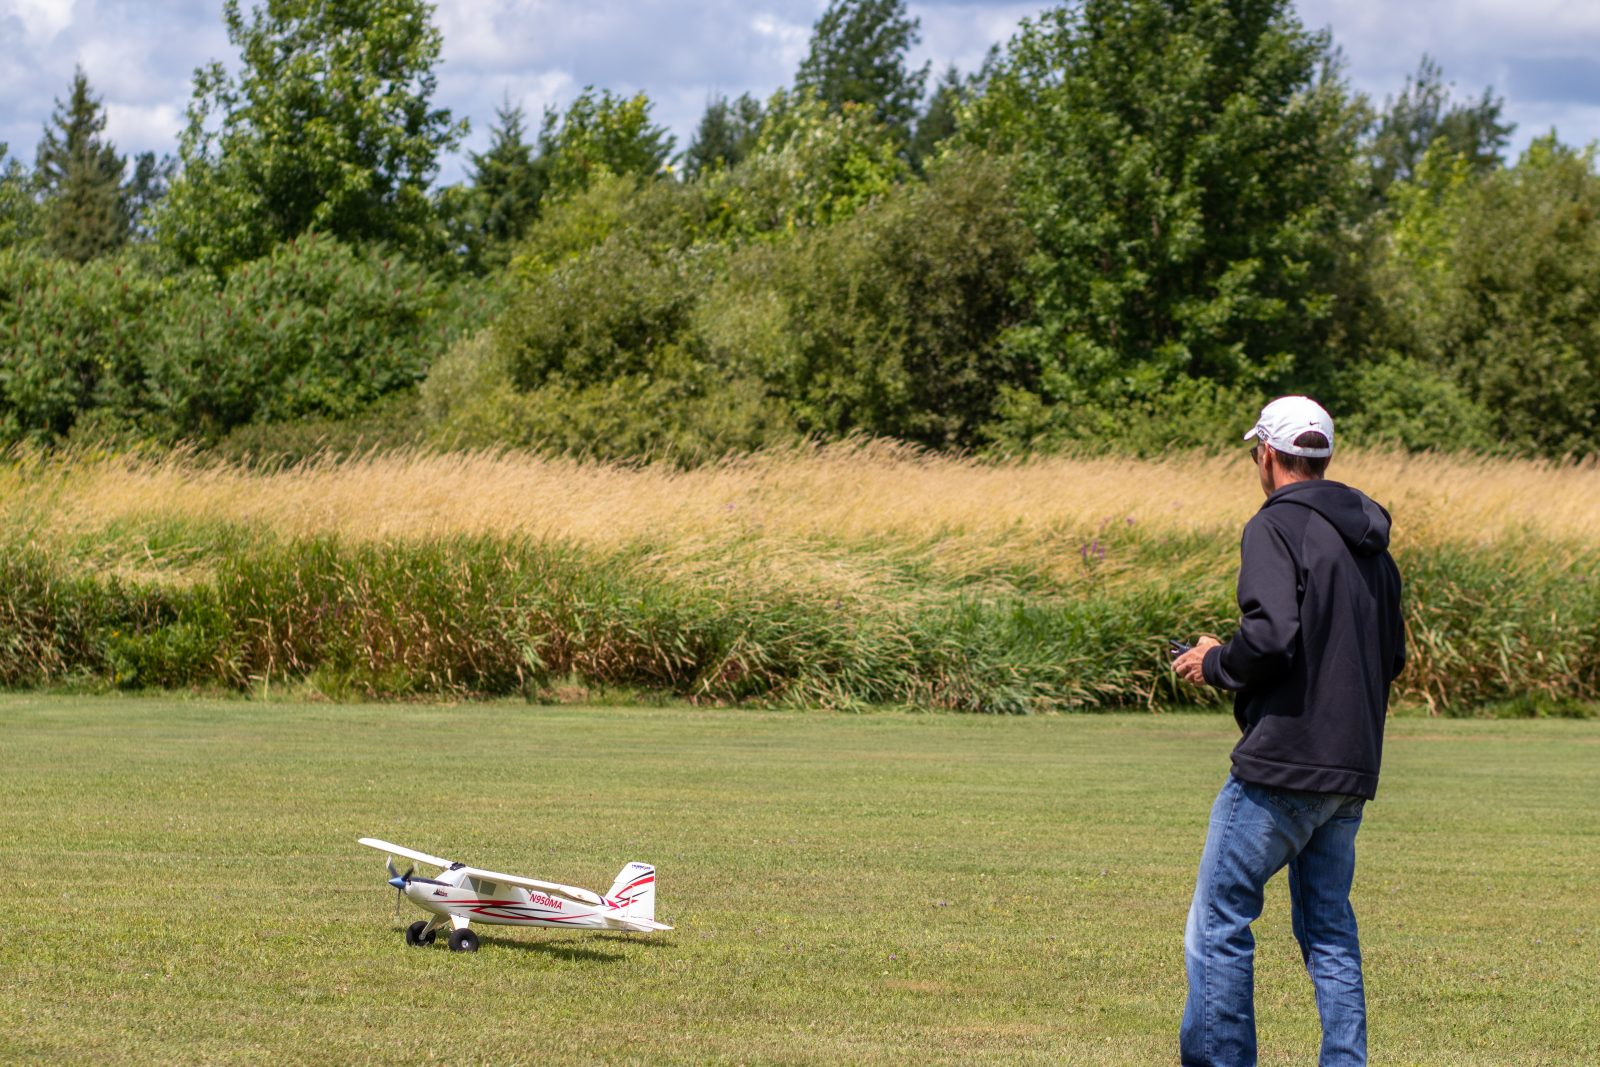 Cornwall Aeromodellers host Fun Fly